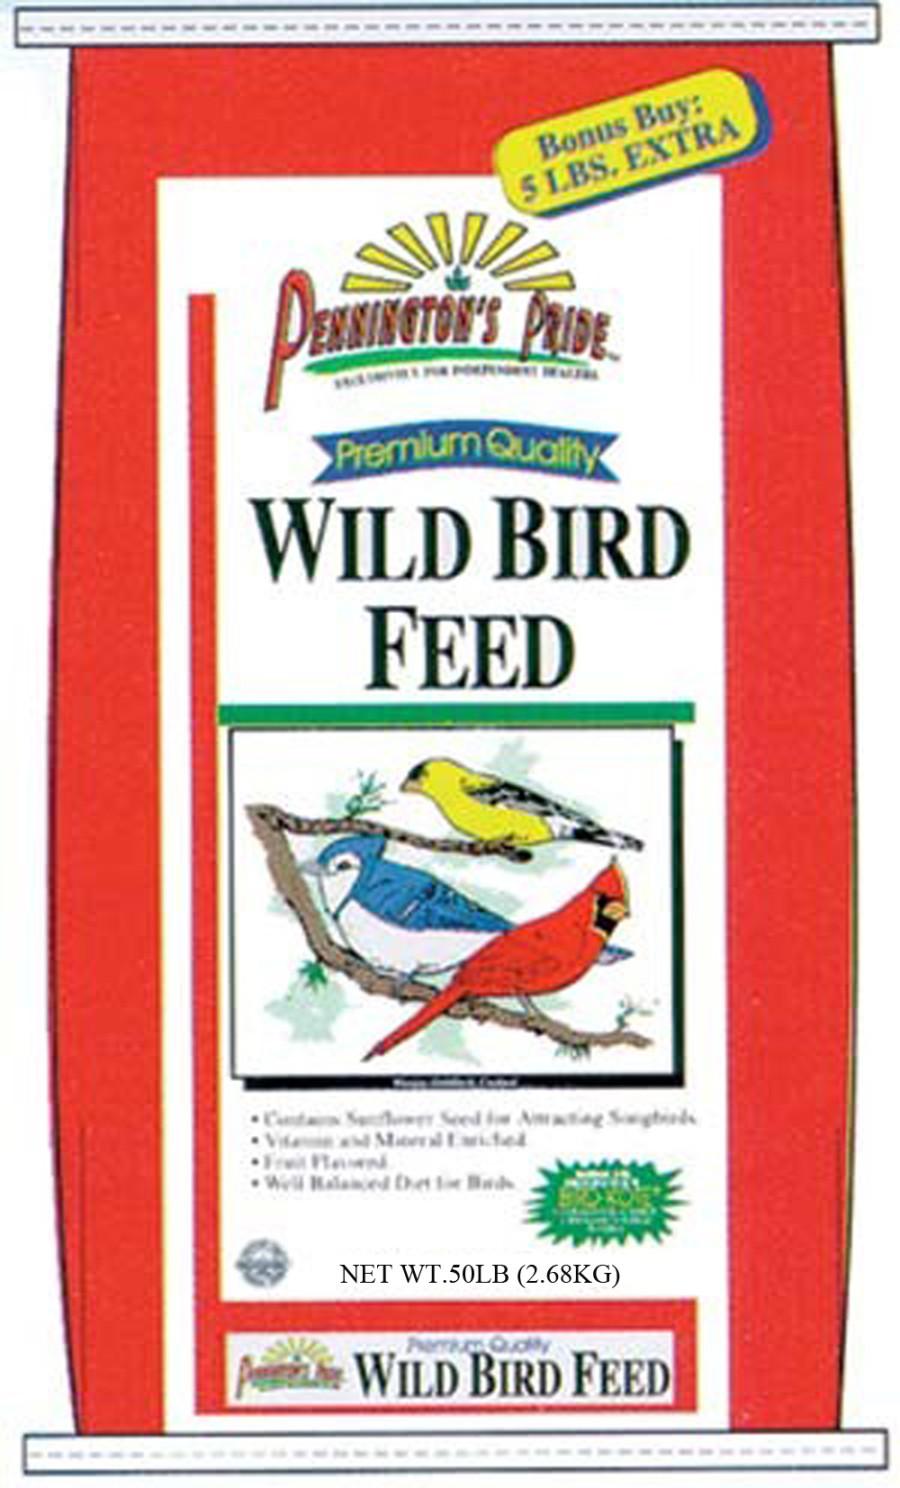 Pennington Pride Wild Bird Feed 1ea/50 lb